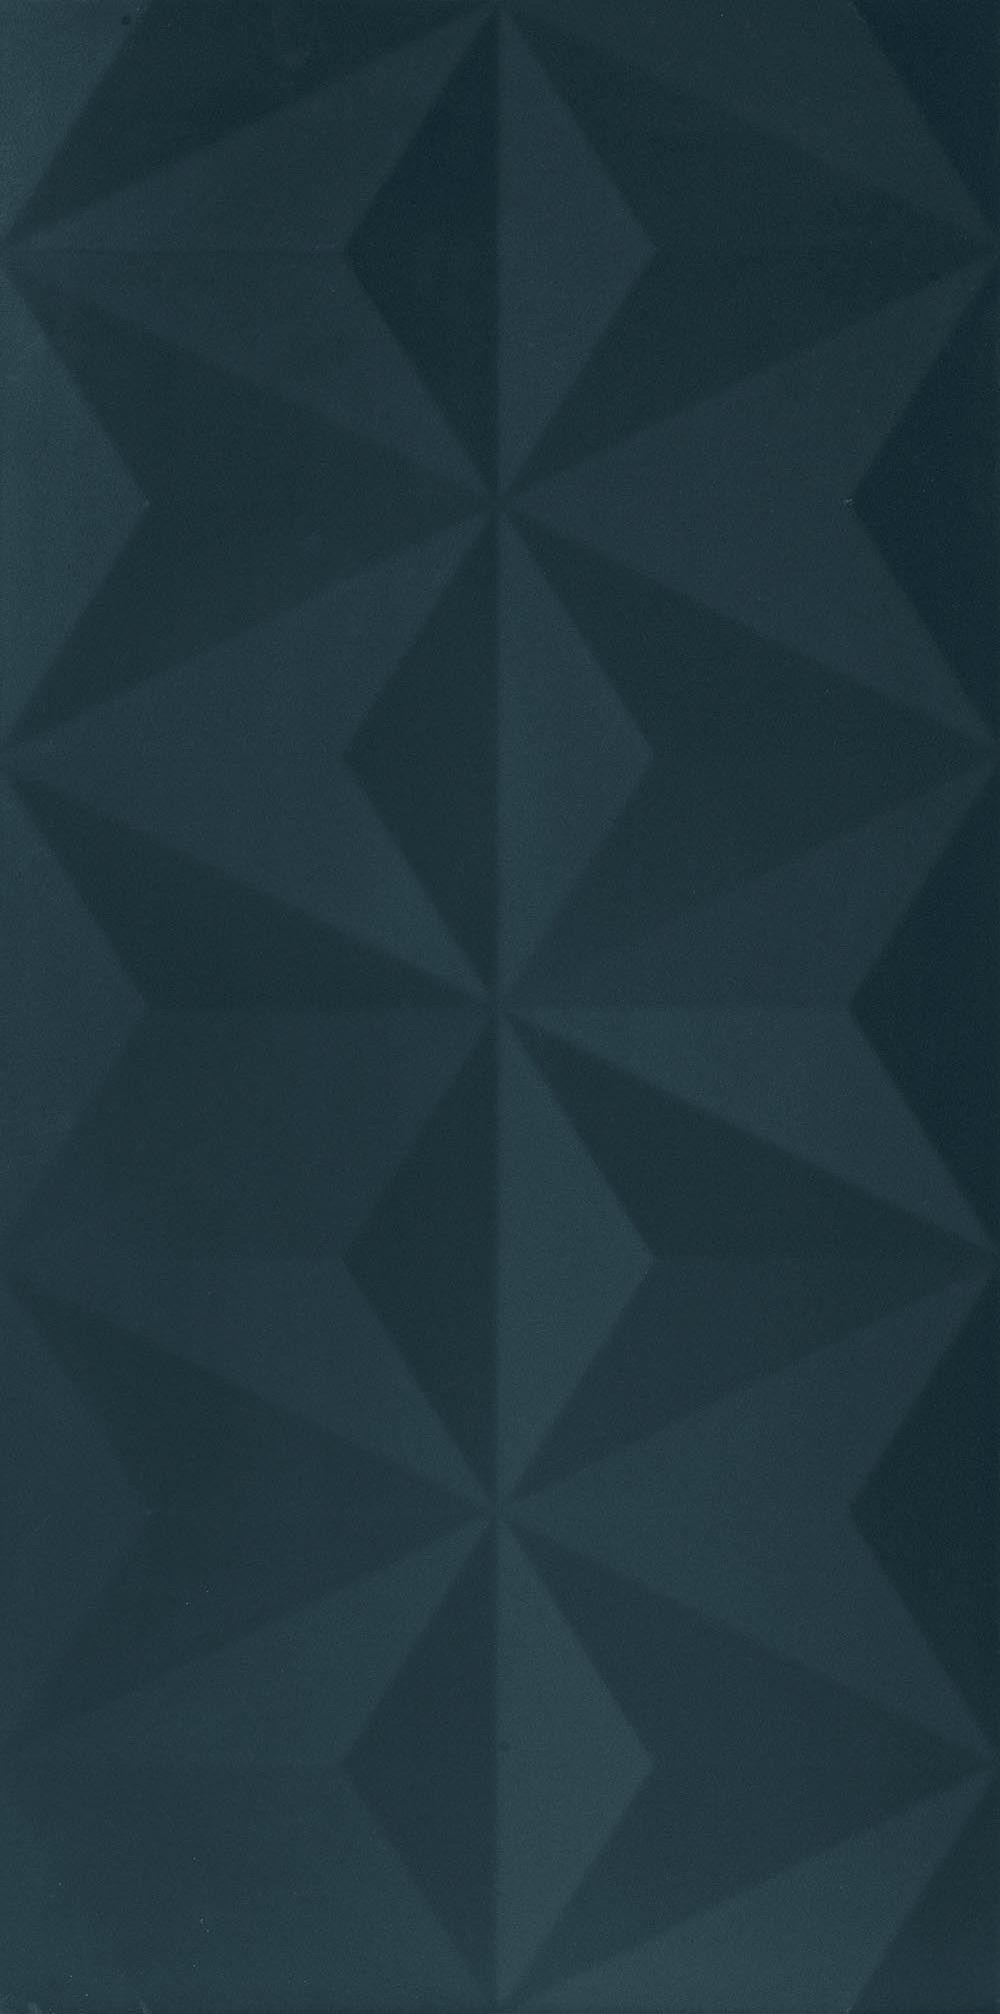 Multidimensional 3d Textured Ceramic Wall Tiles Creative Materials Wall Tiles Ceramic Wall Tiles Diamond Tile